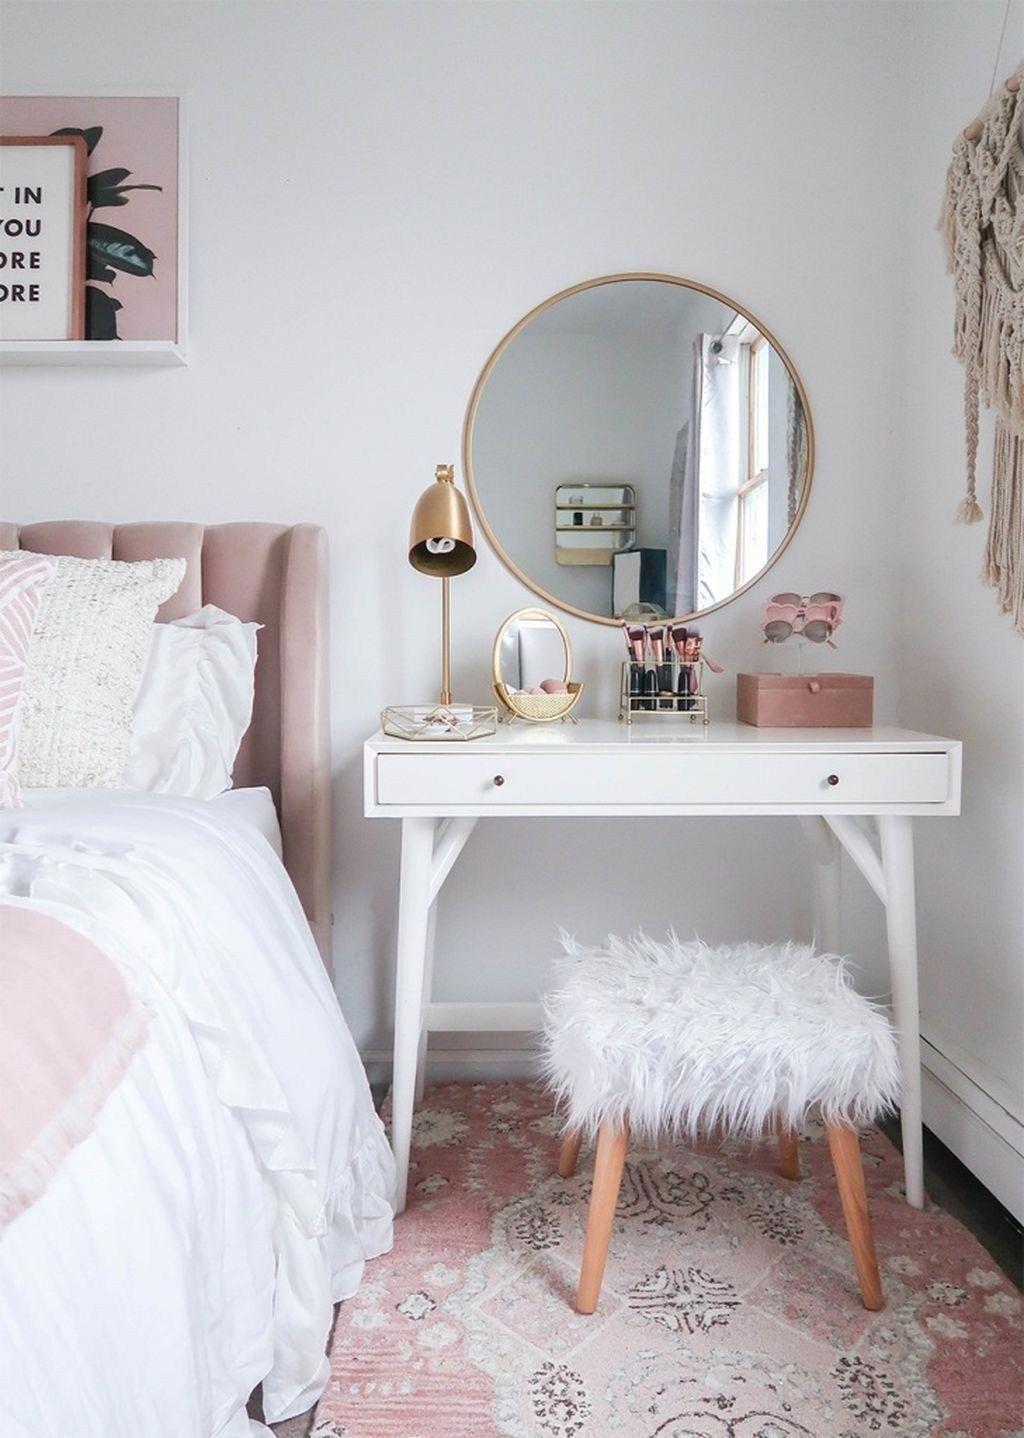 66 Premium MidSized Contemporary Guest Bedroom Design